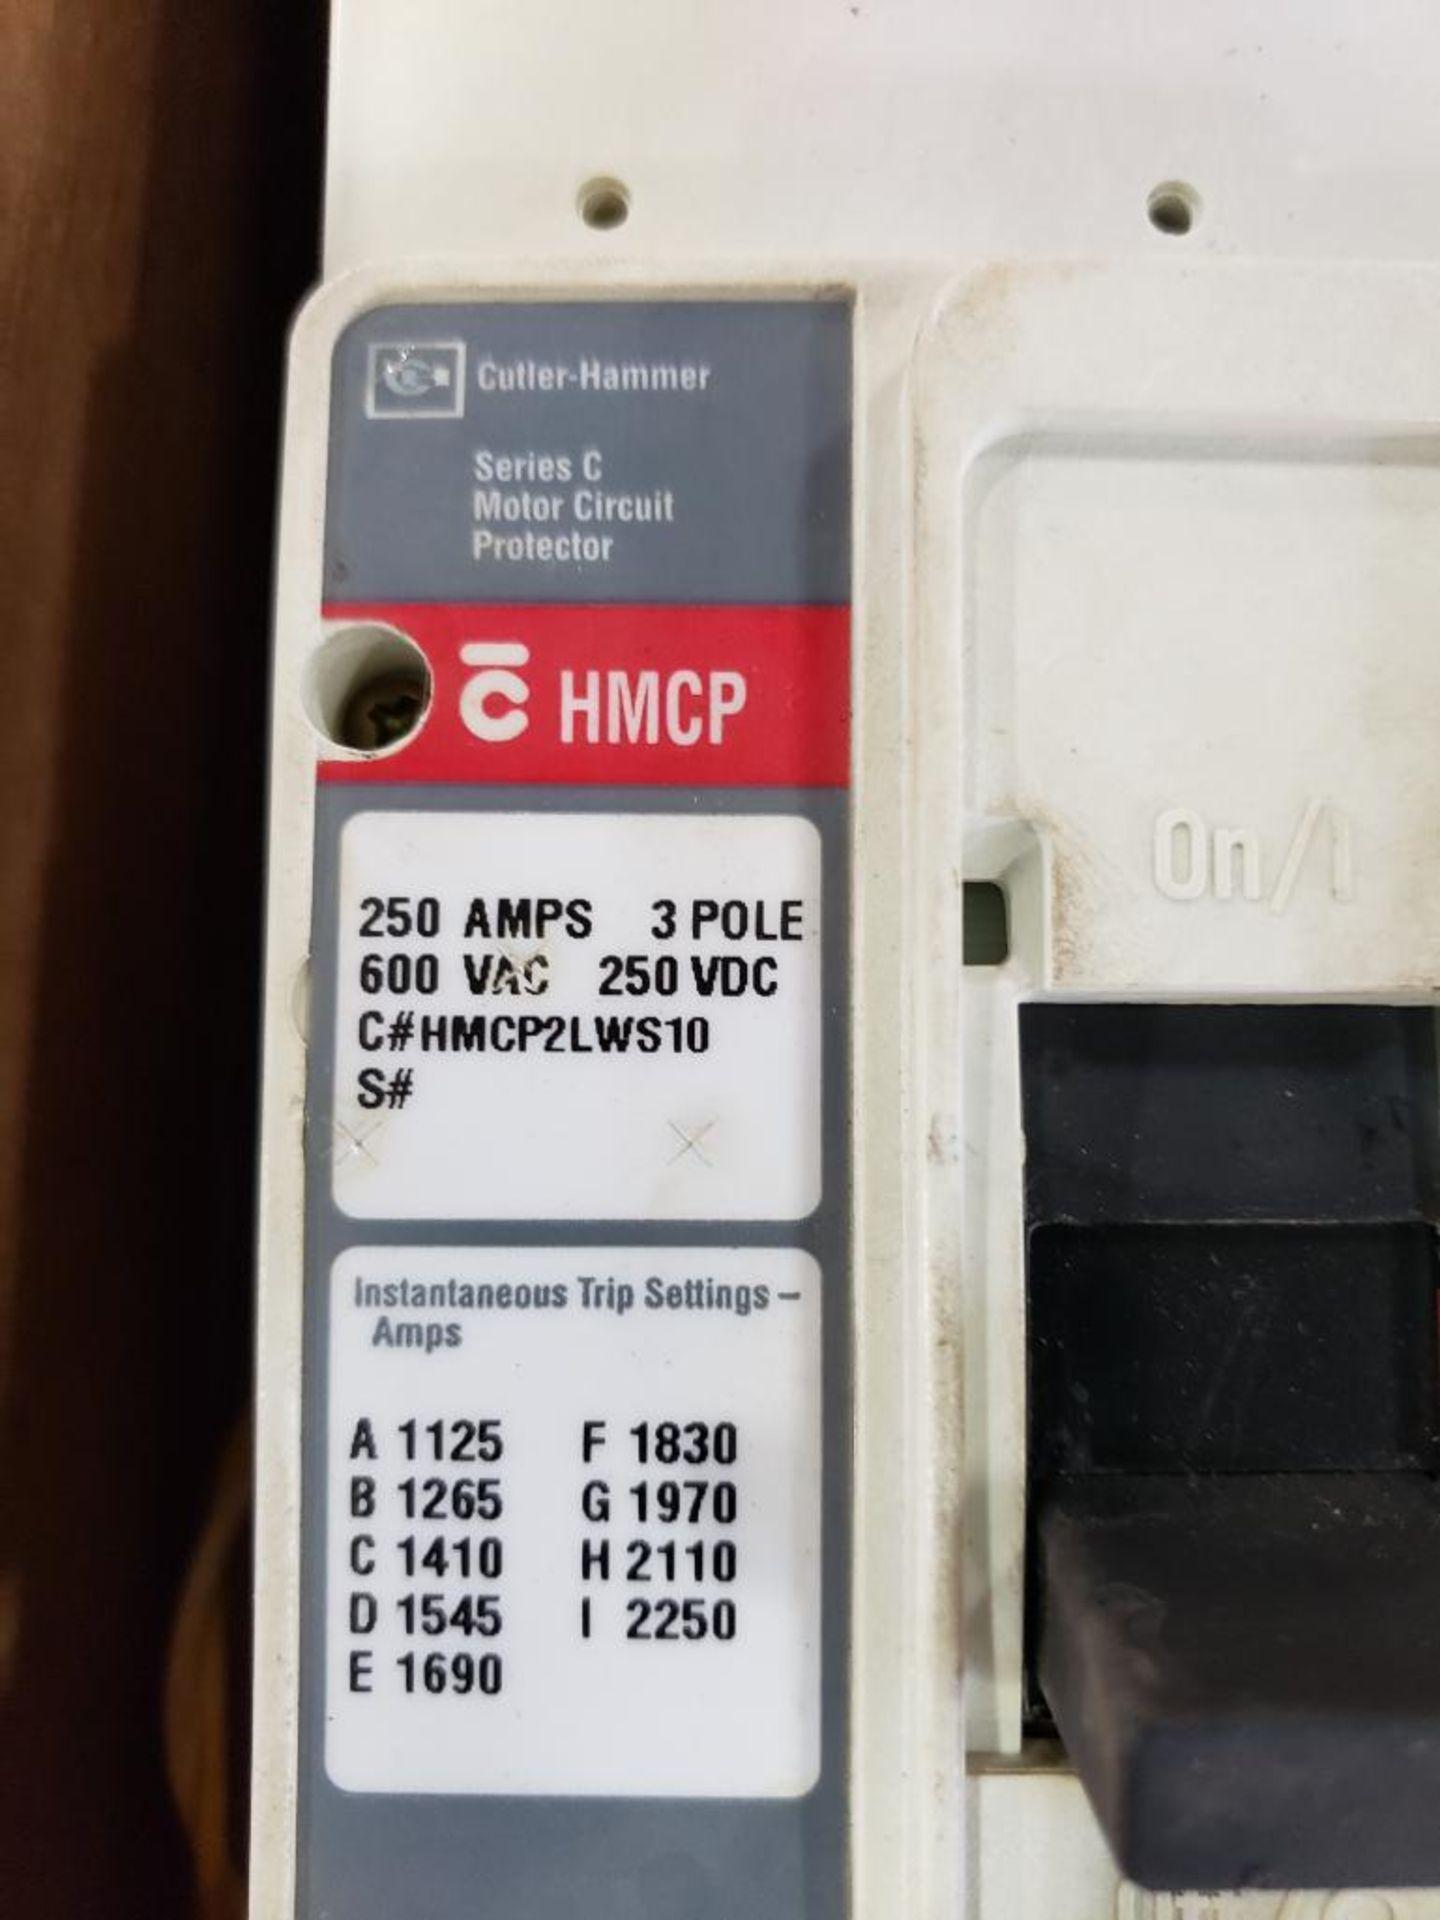 Cutler Hammer CHMCP HMCP2LWS10 250AMP Molded case breaker. - Image 2 of 4